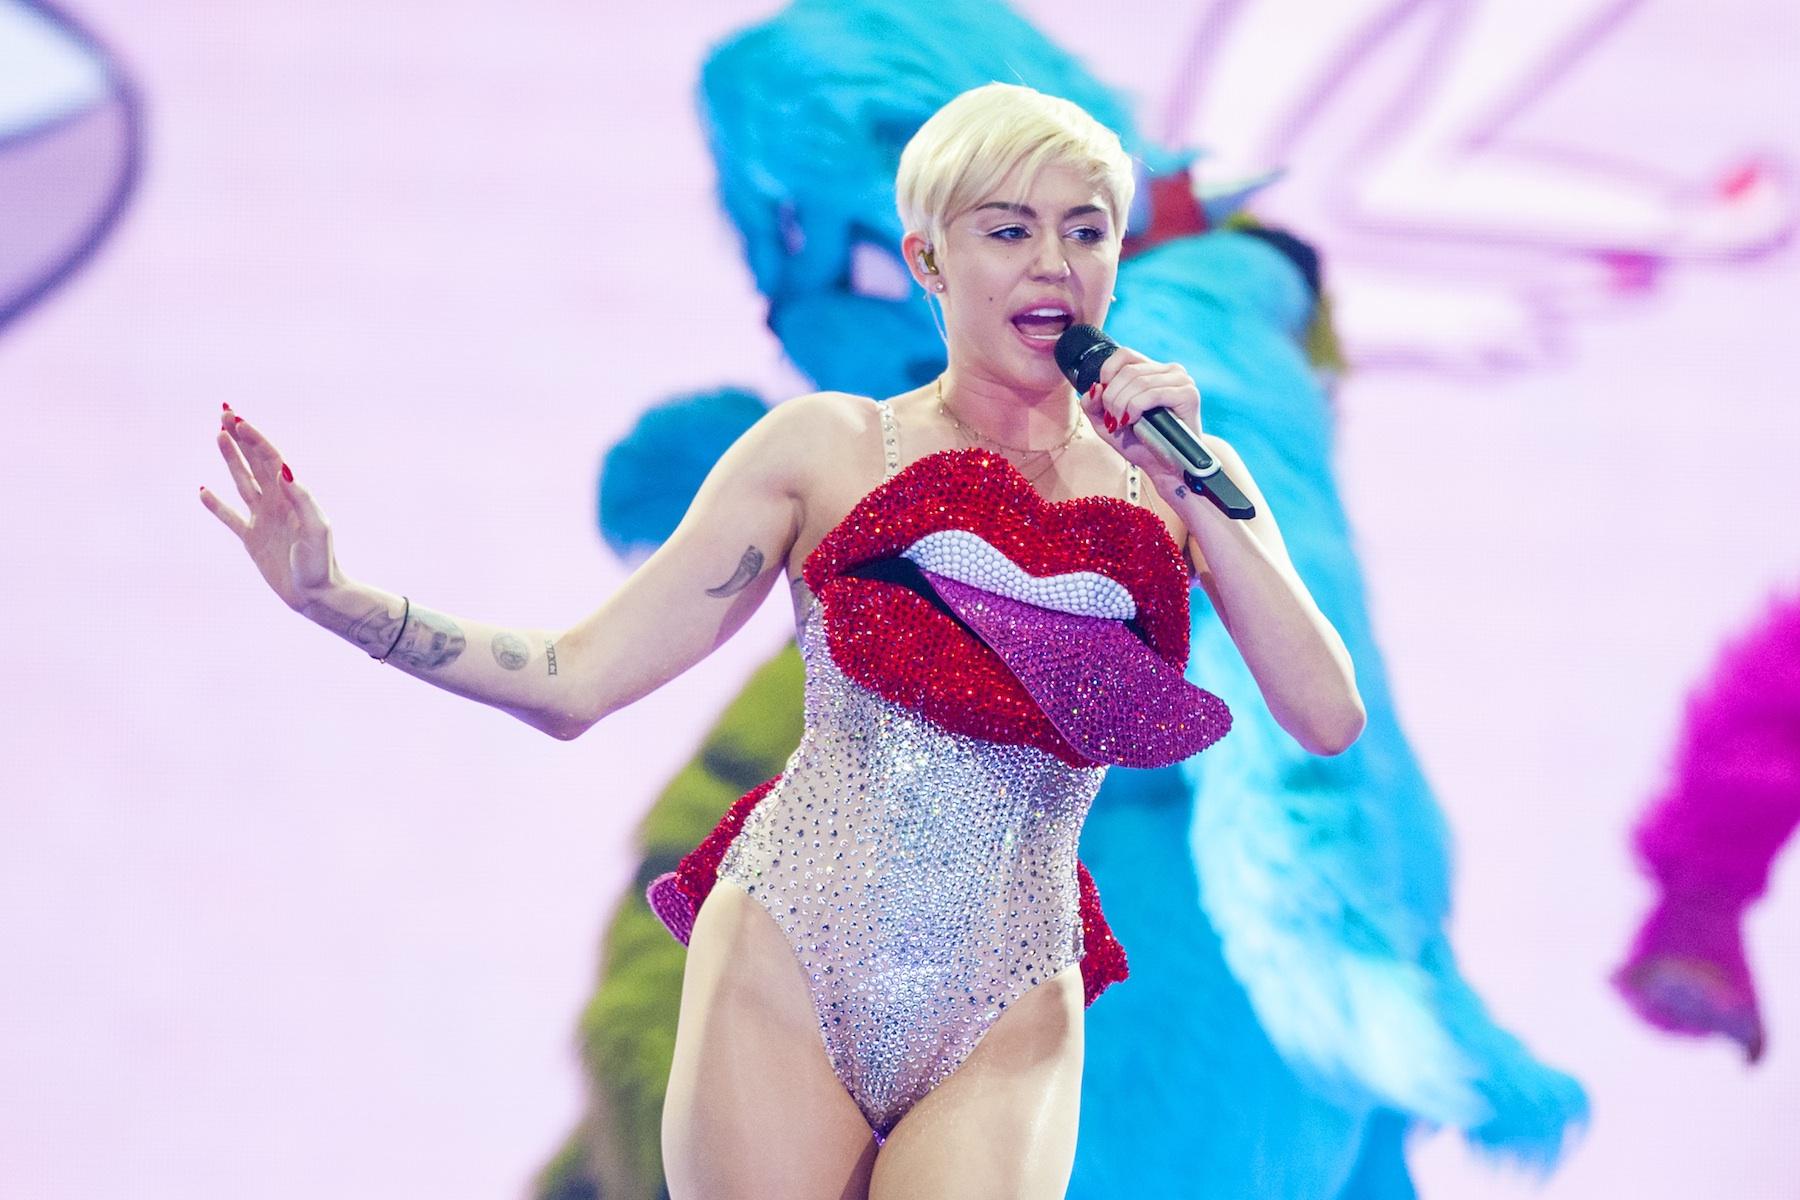 Miley Cyrus Gets Restraining Order Against Fan